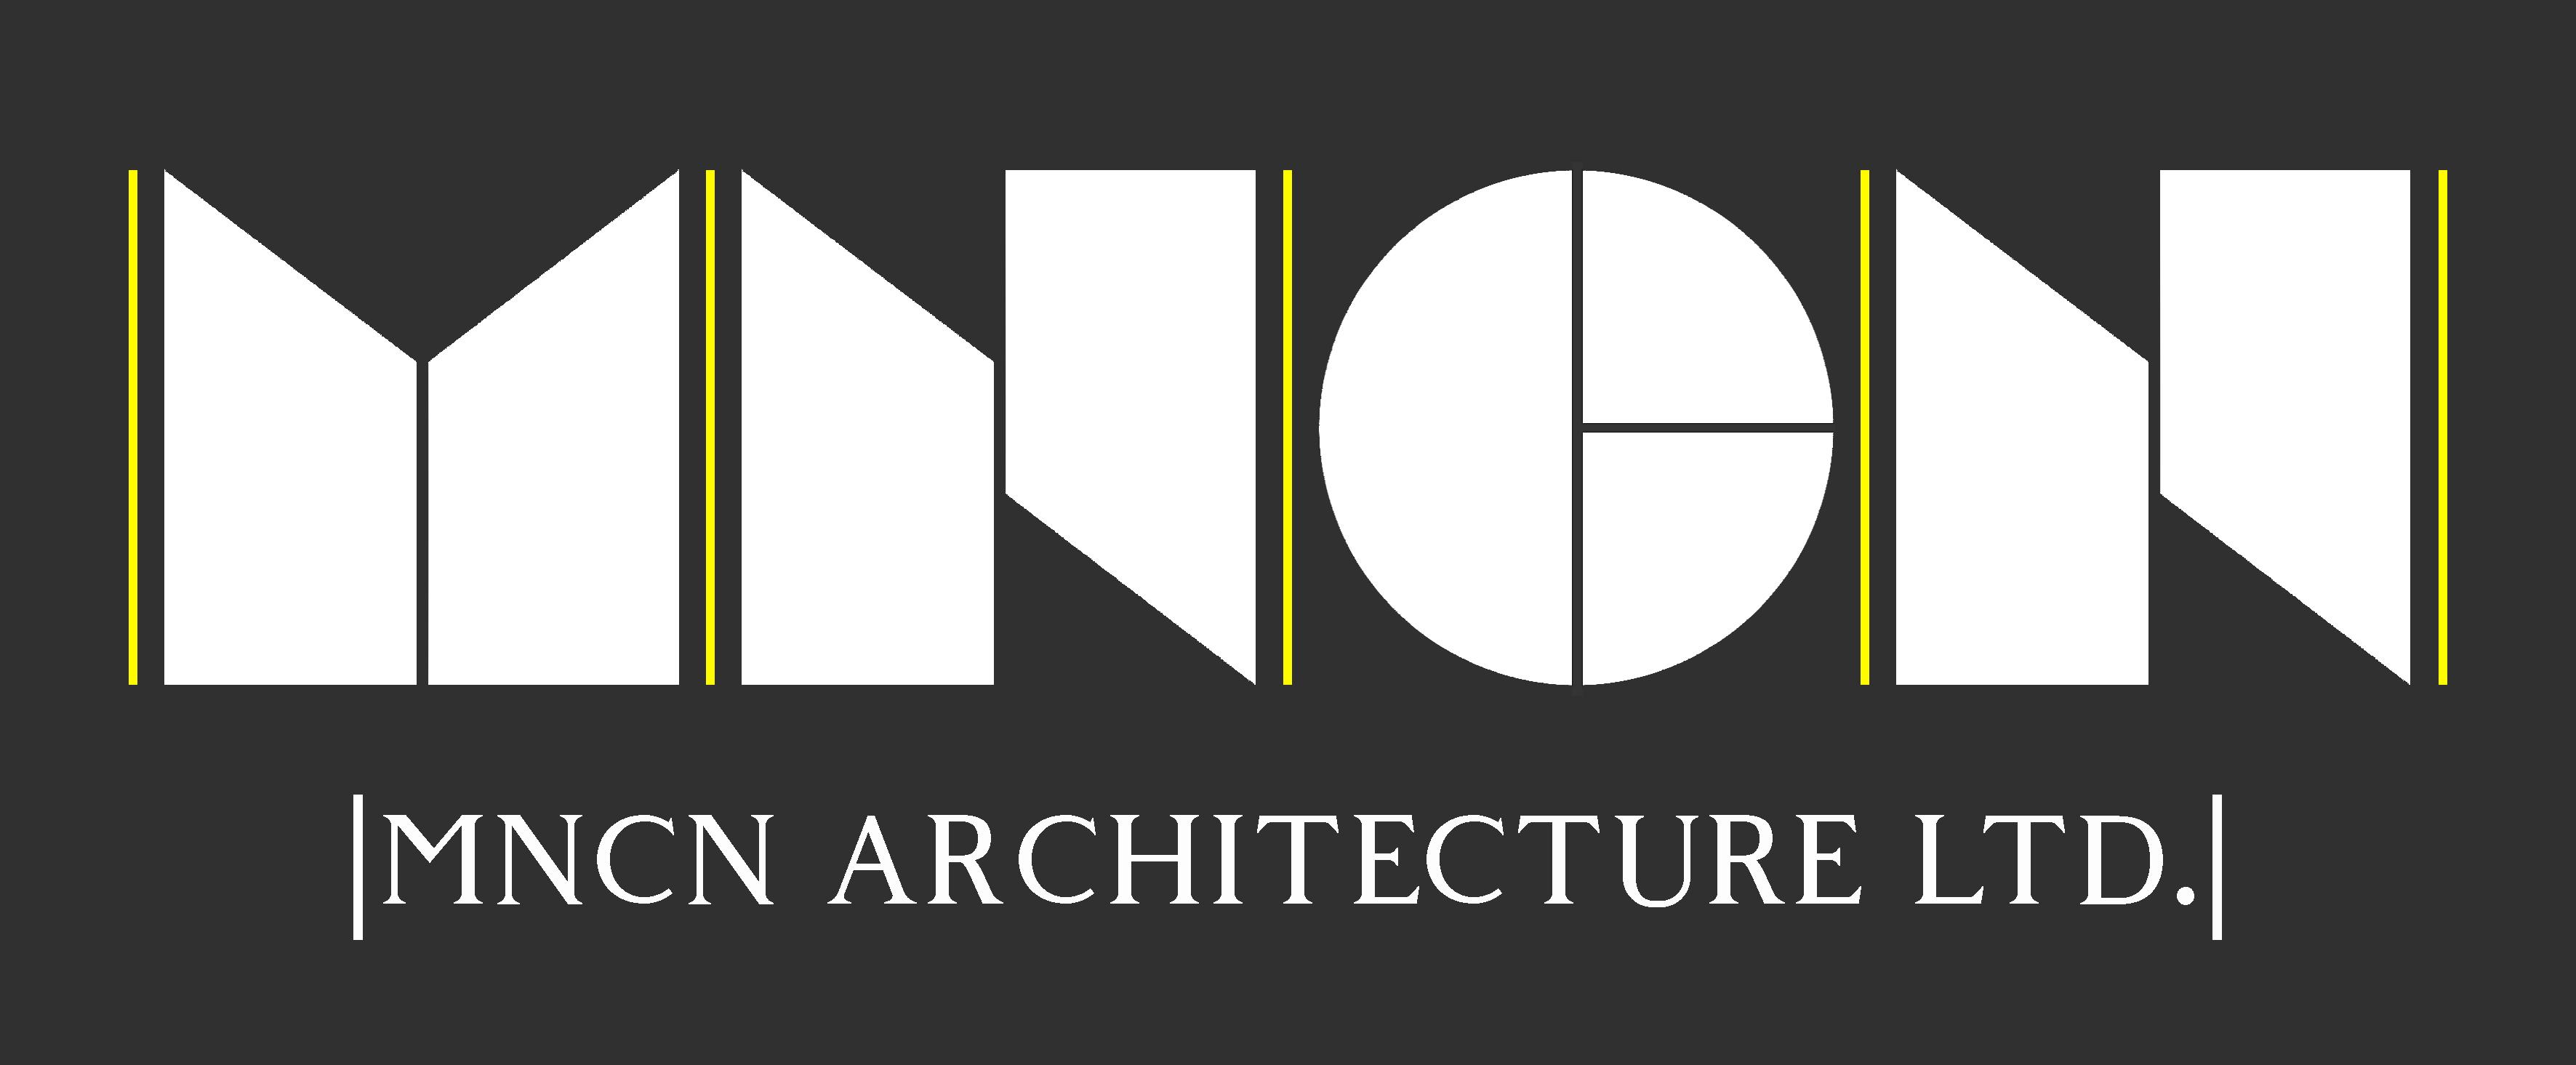 | MNCN ARCHITECTURE LTD. |  HOME |